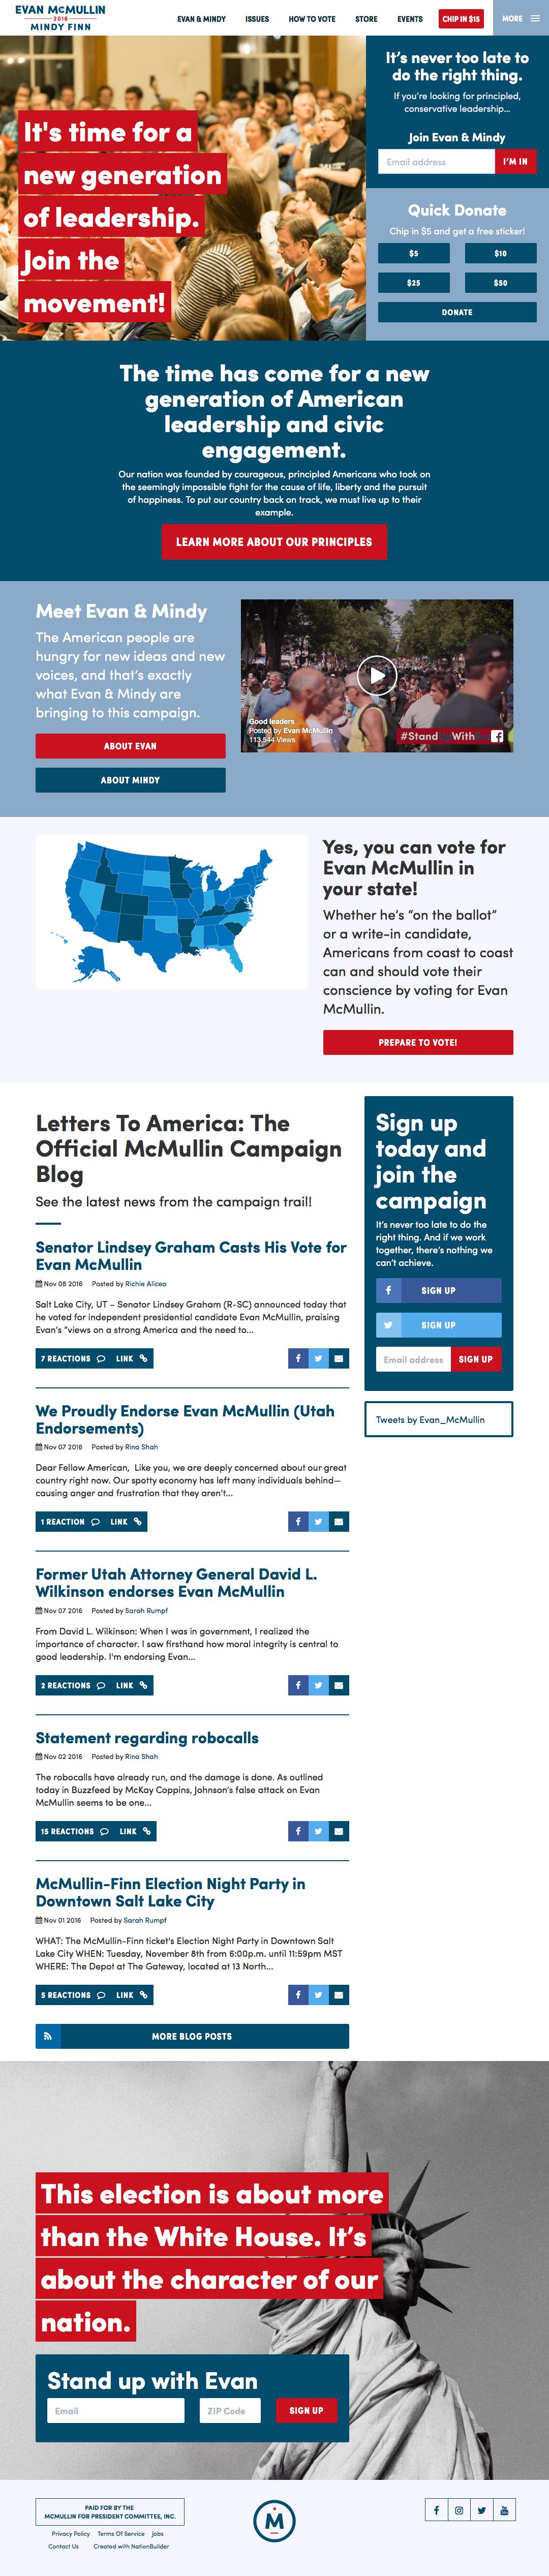 Screenshot: Homepage